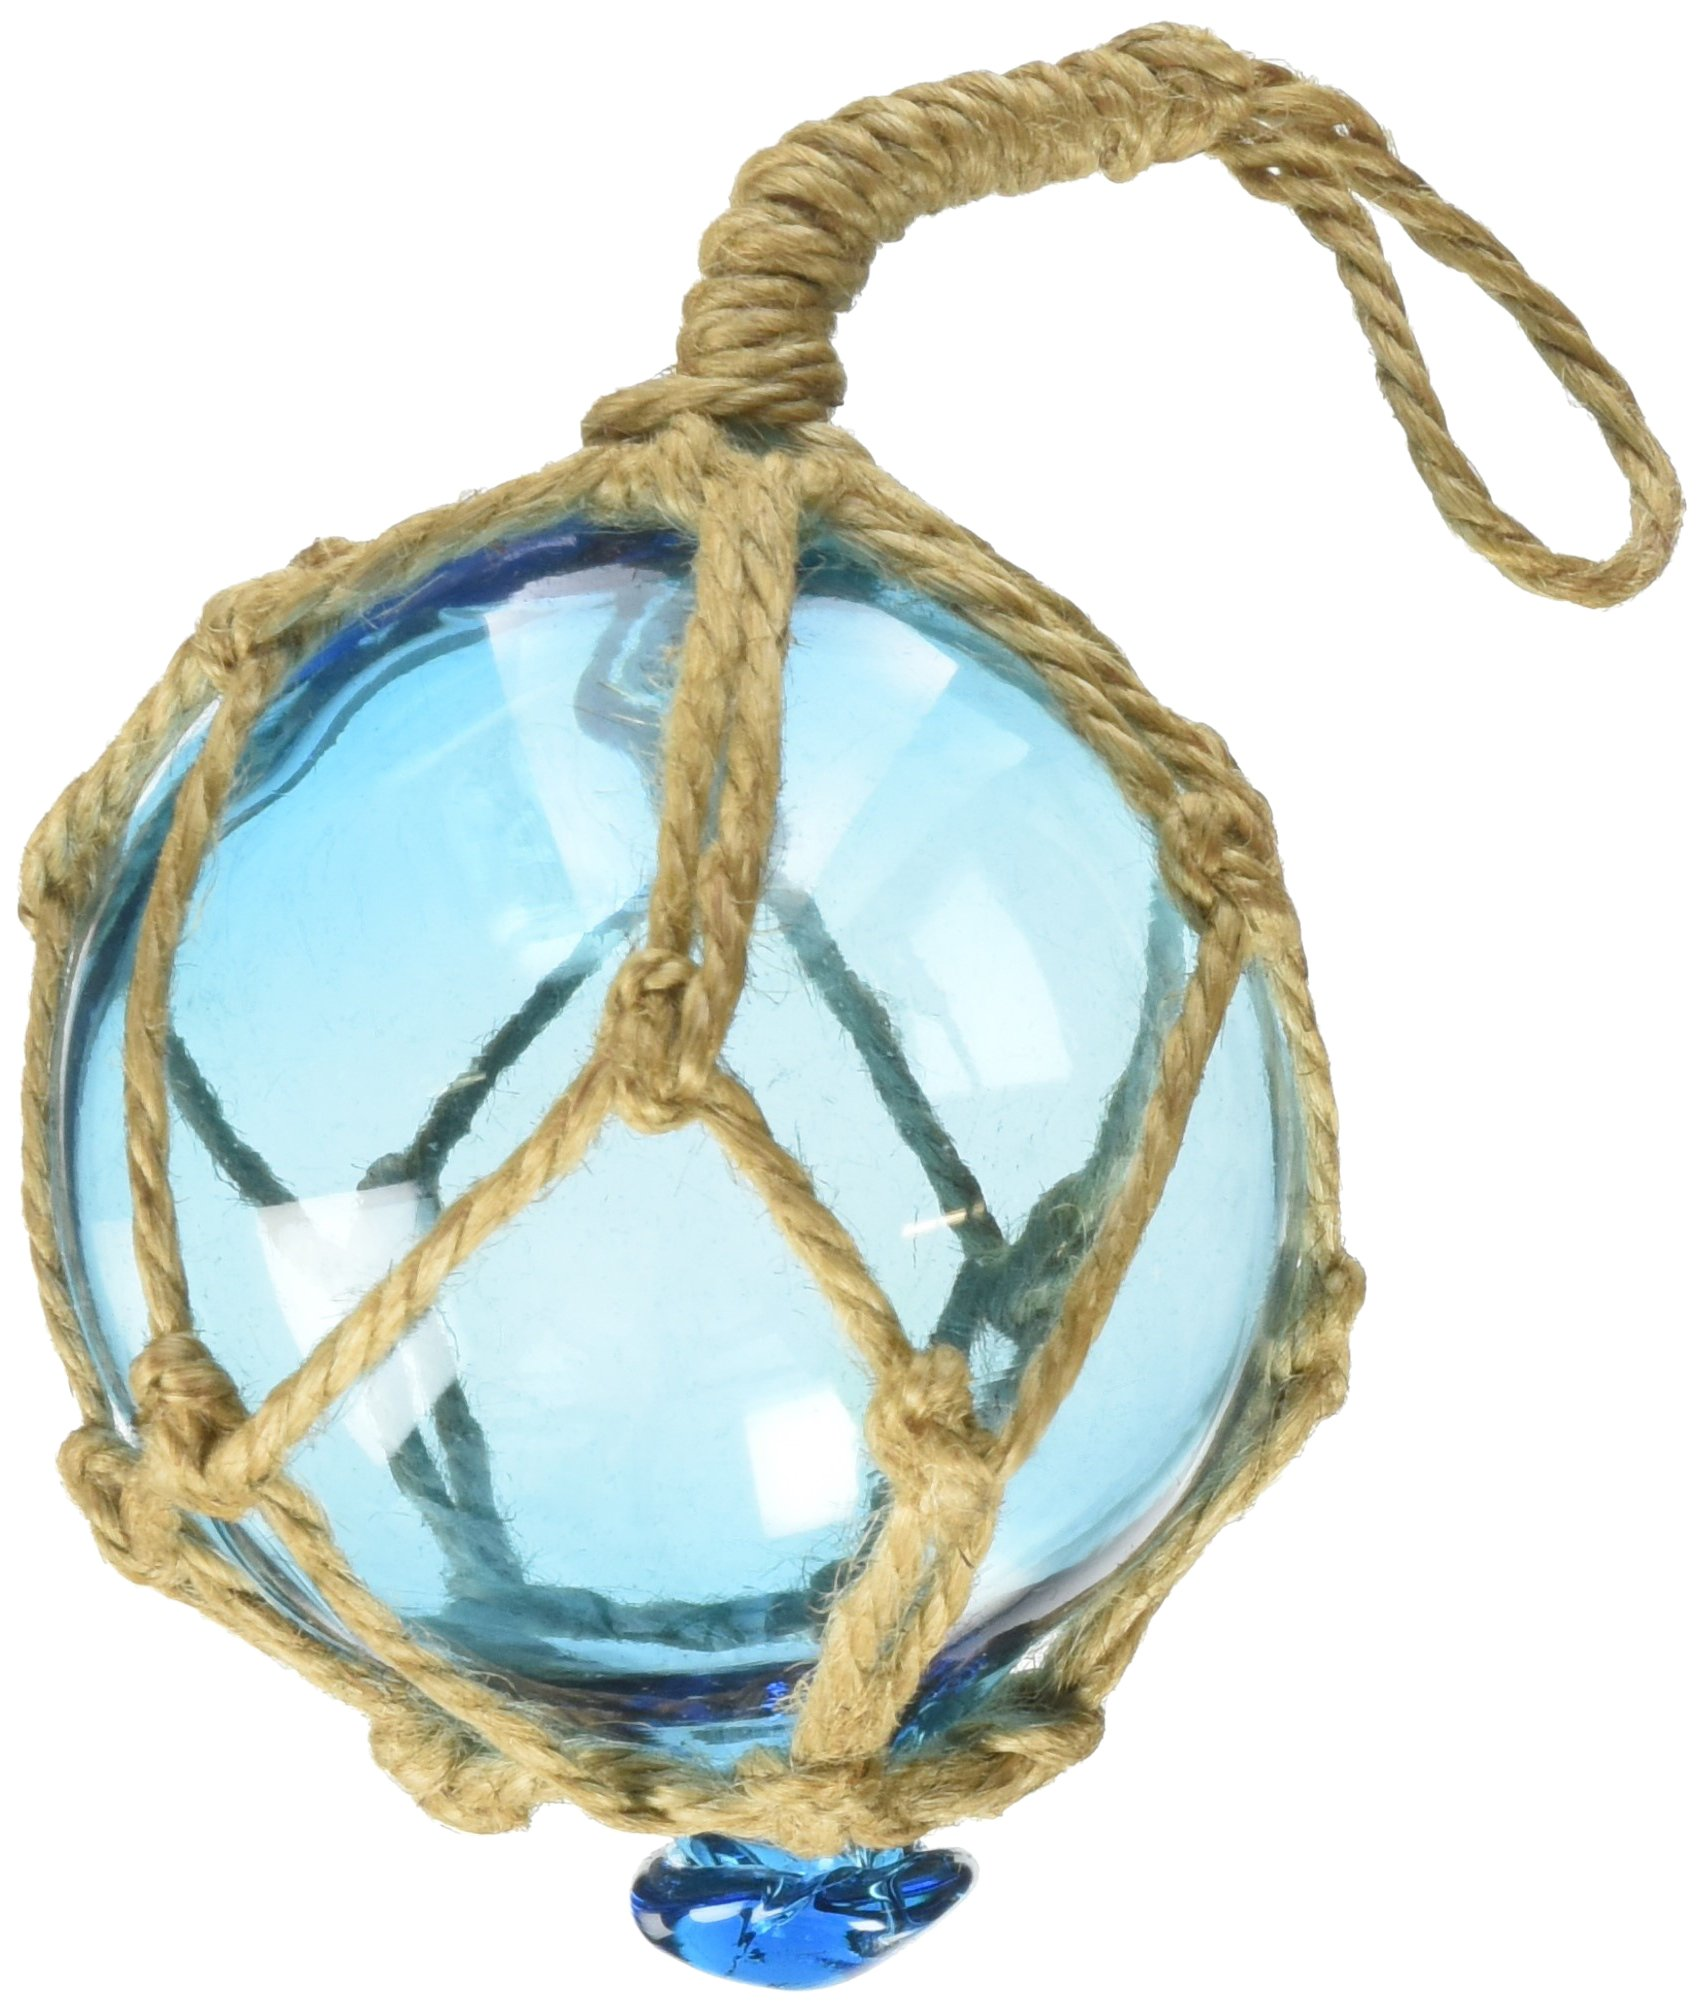 Hampton Nautical Light Blue Japanese Glass Ball Fishing Float with Brown Netting Decoration Christmas Ornament, 3''